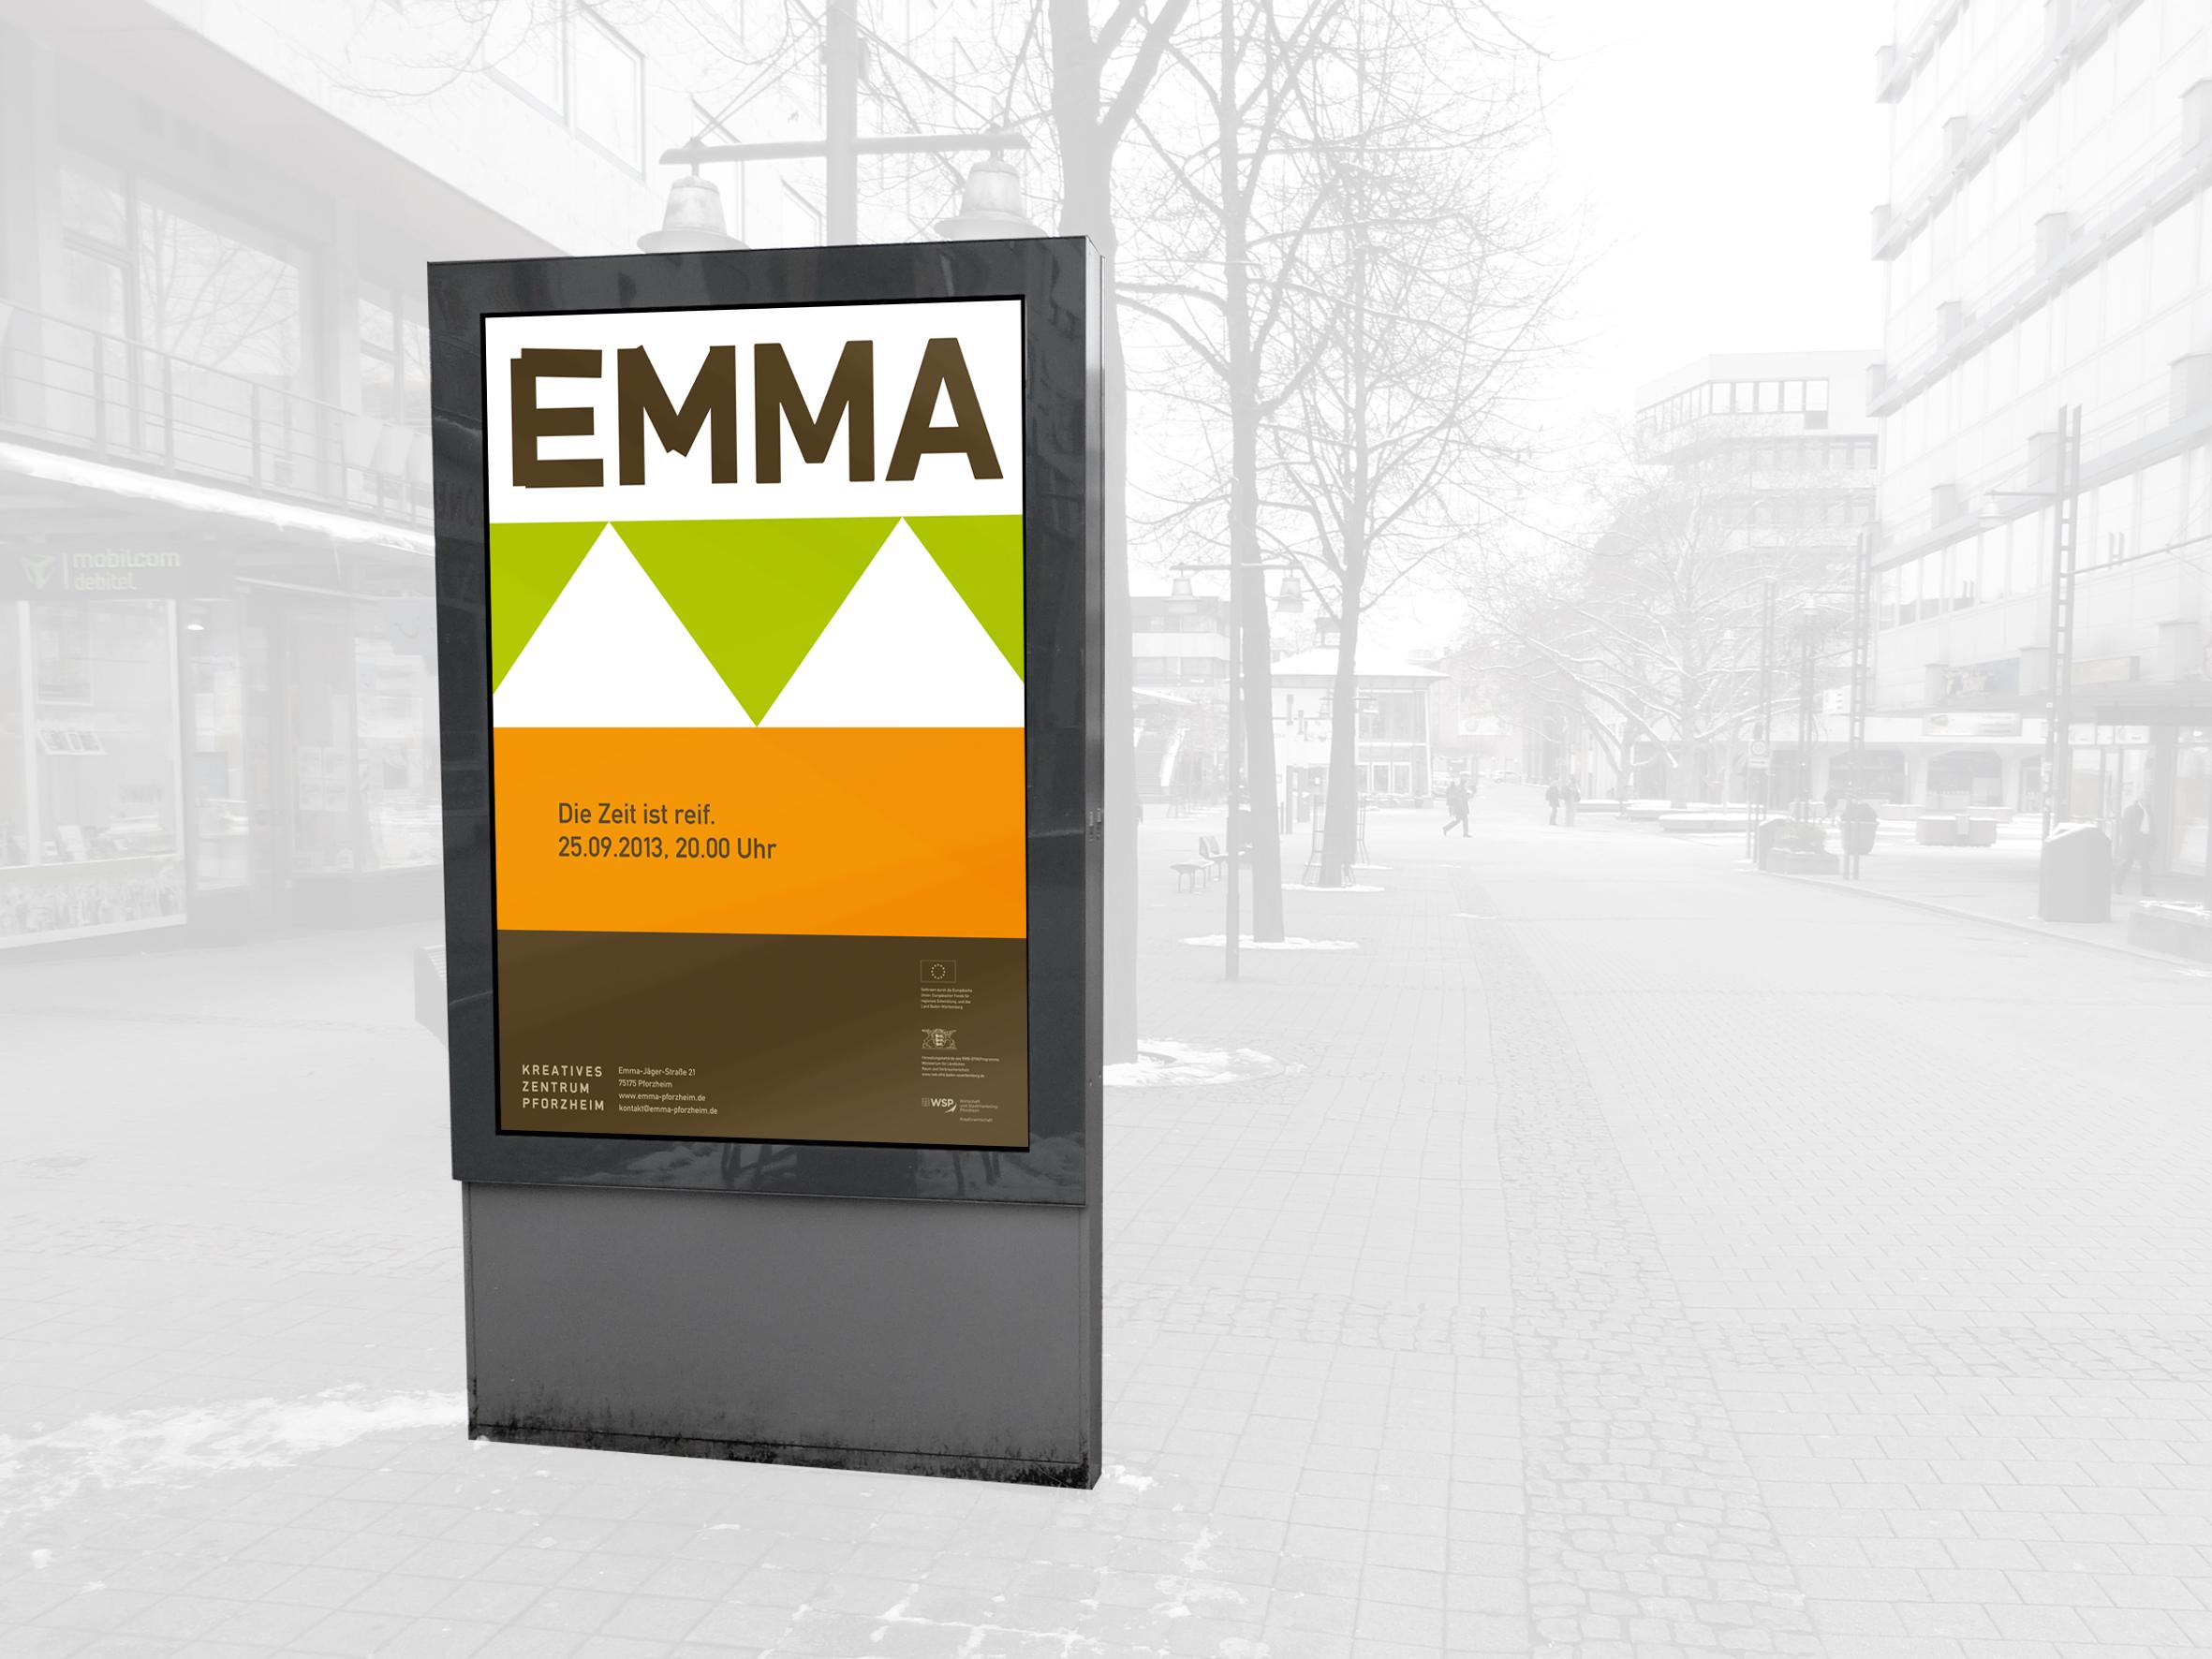 cobra-emma-pforzheim-kampagne-phase_3-plakat-citylight